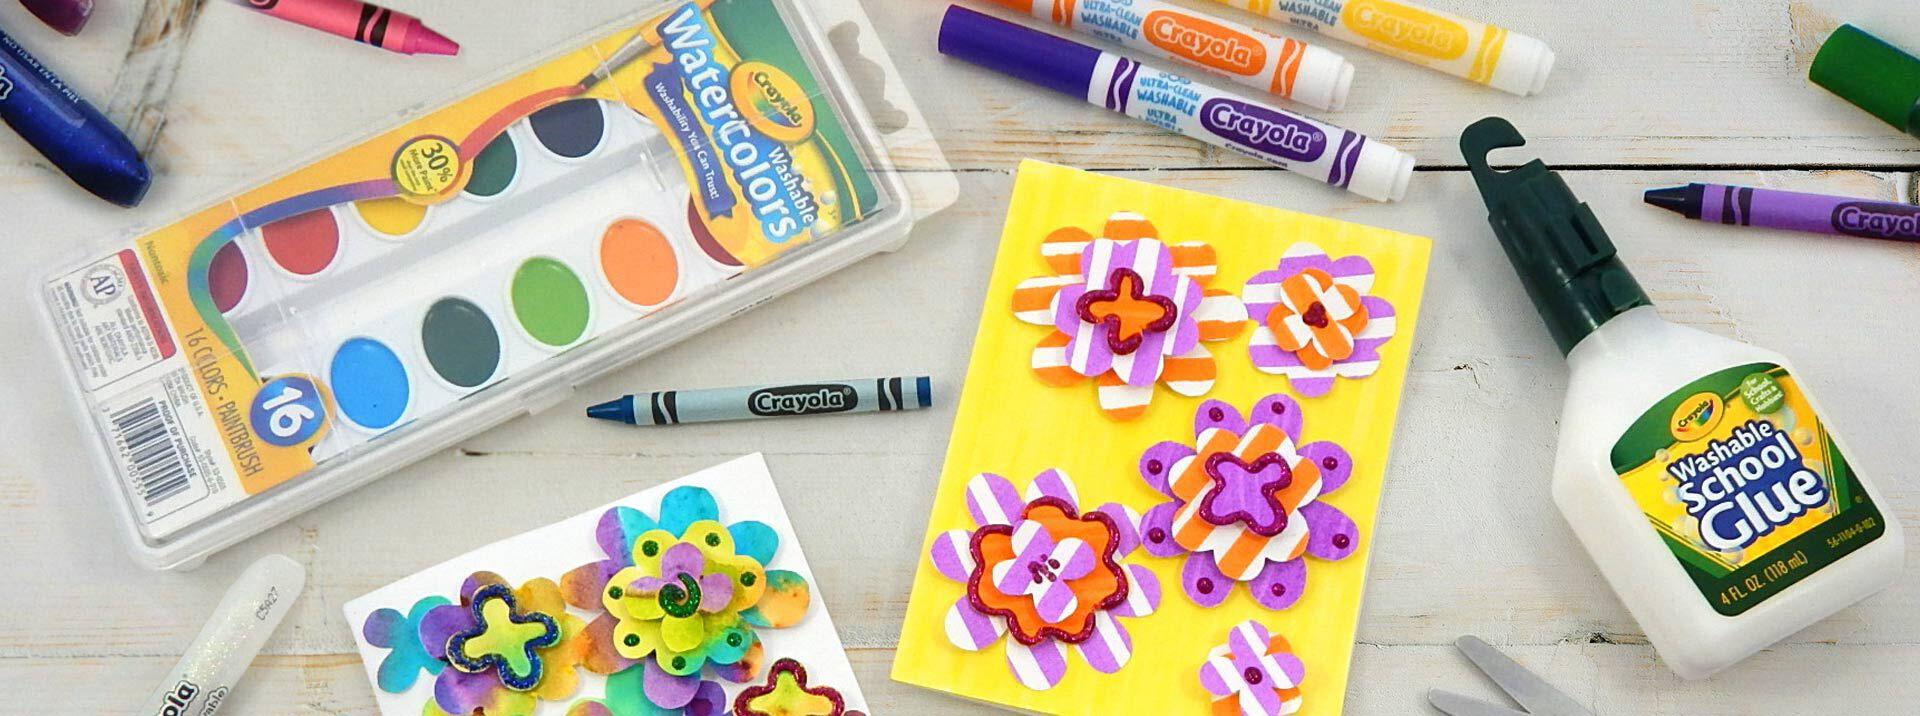 Craft Materials Kits